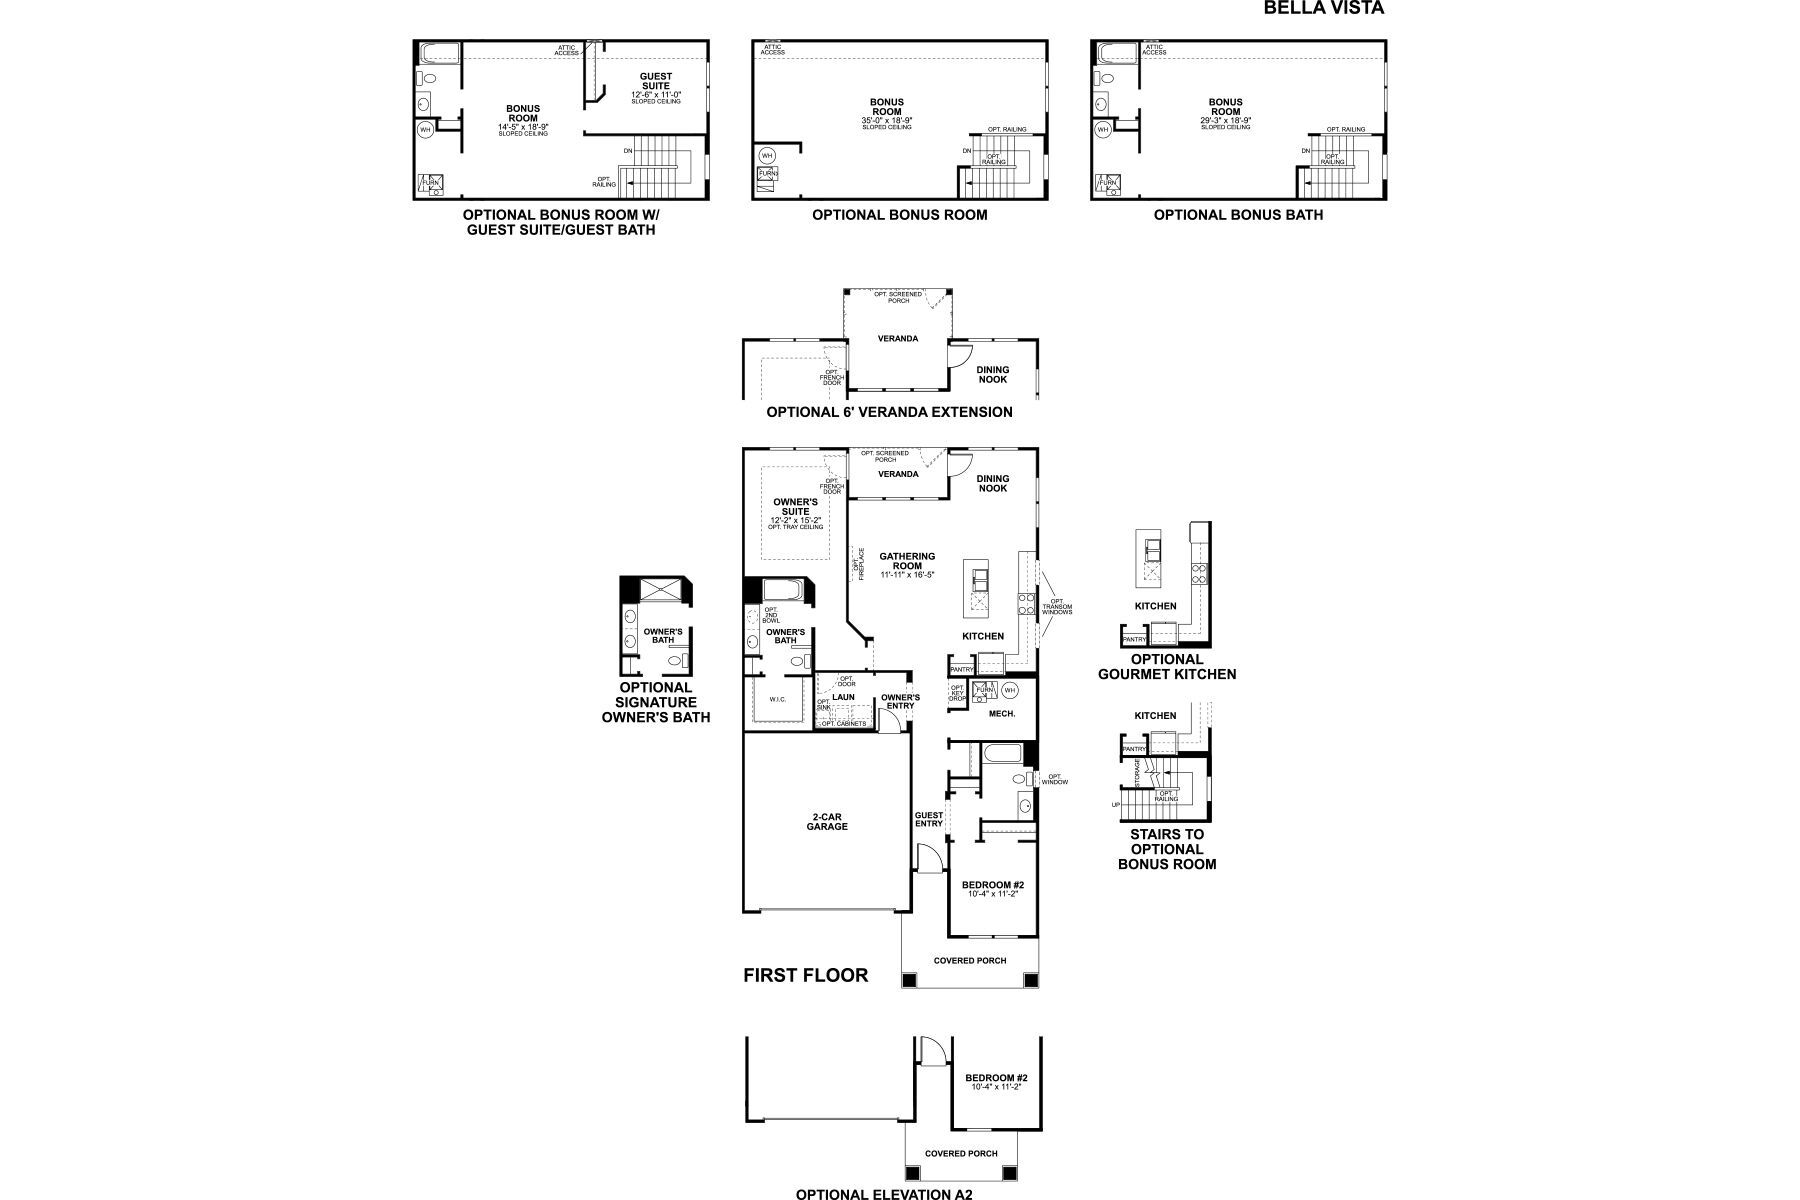 Bellavista Floorplan